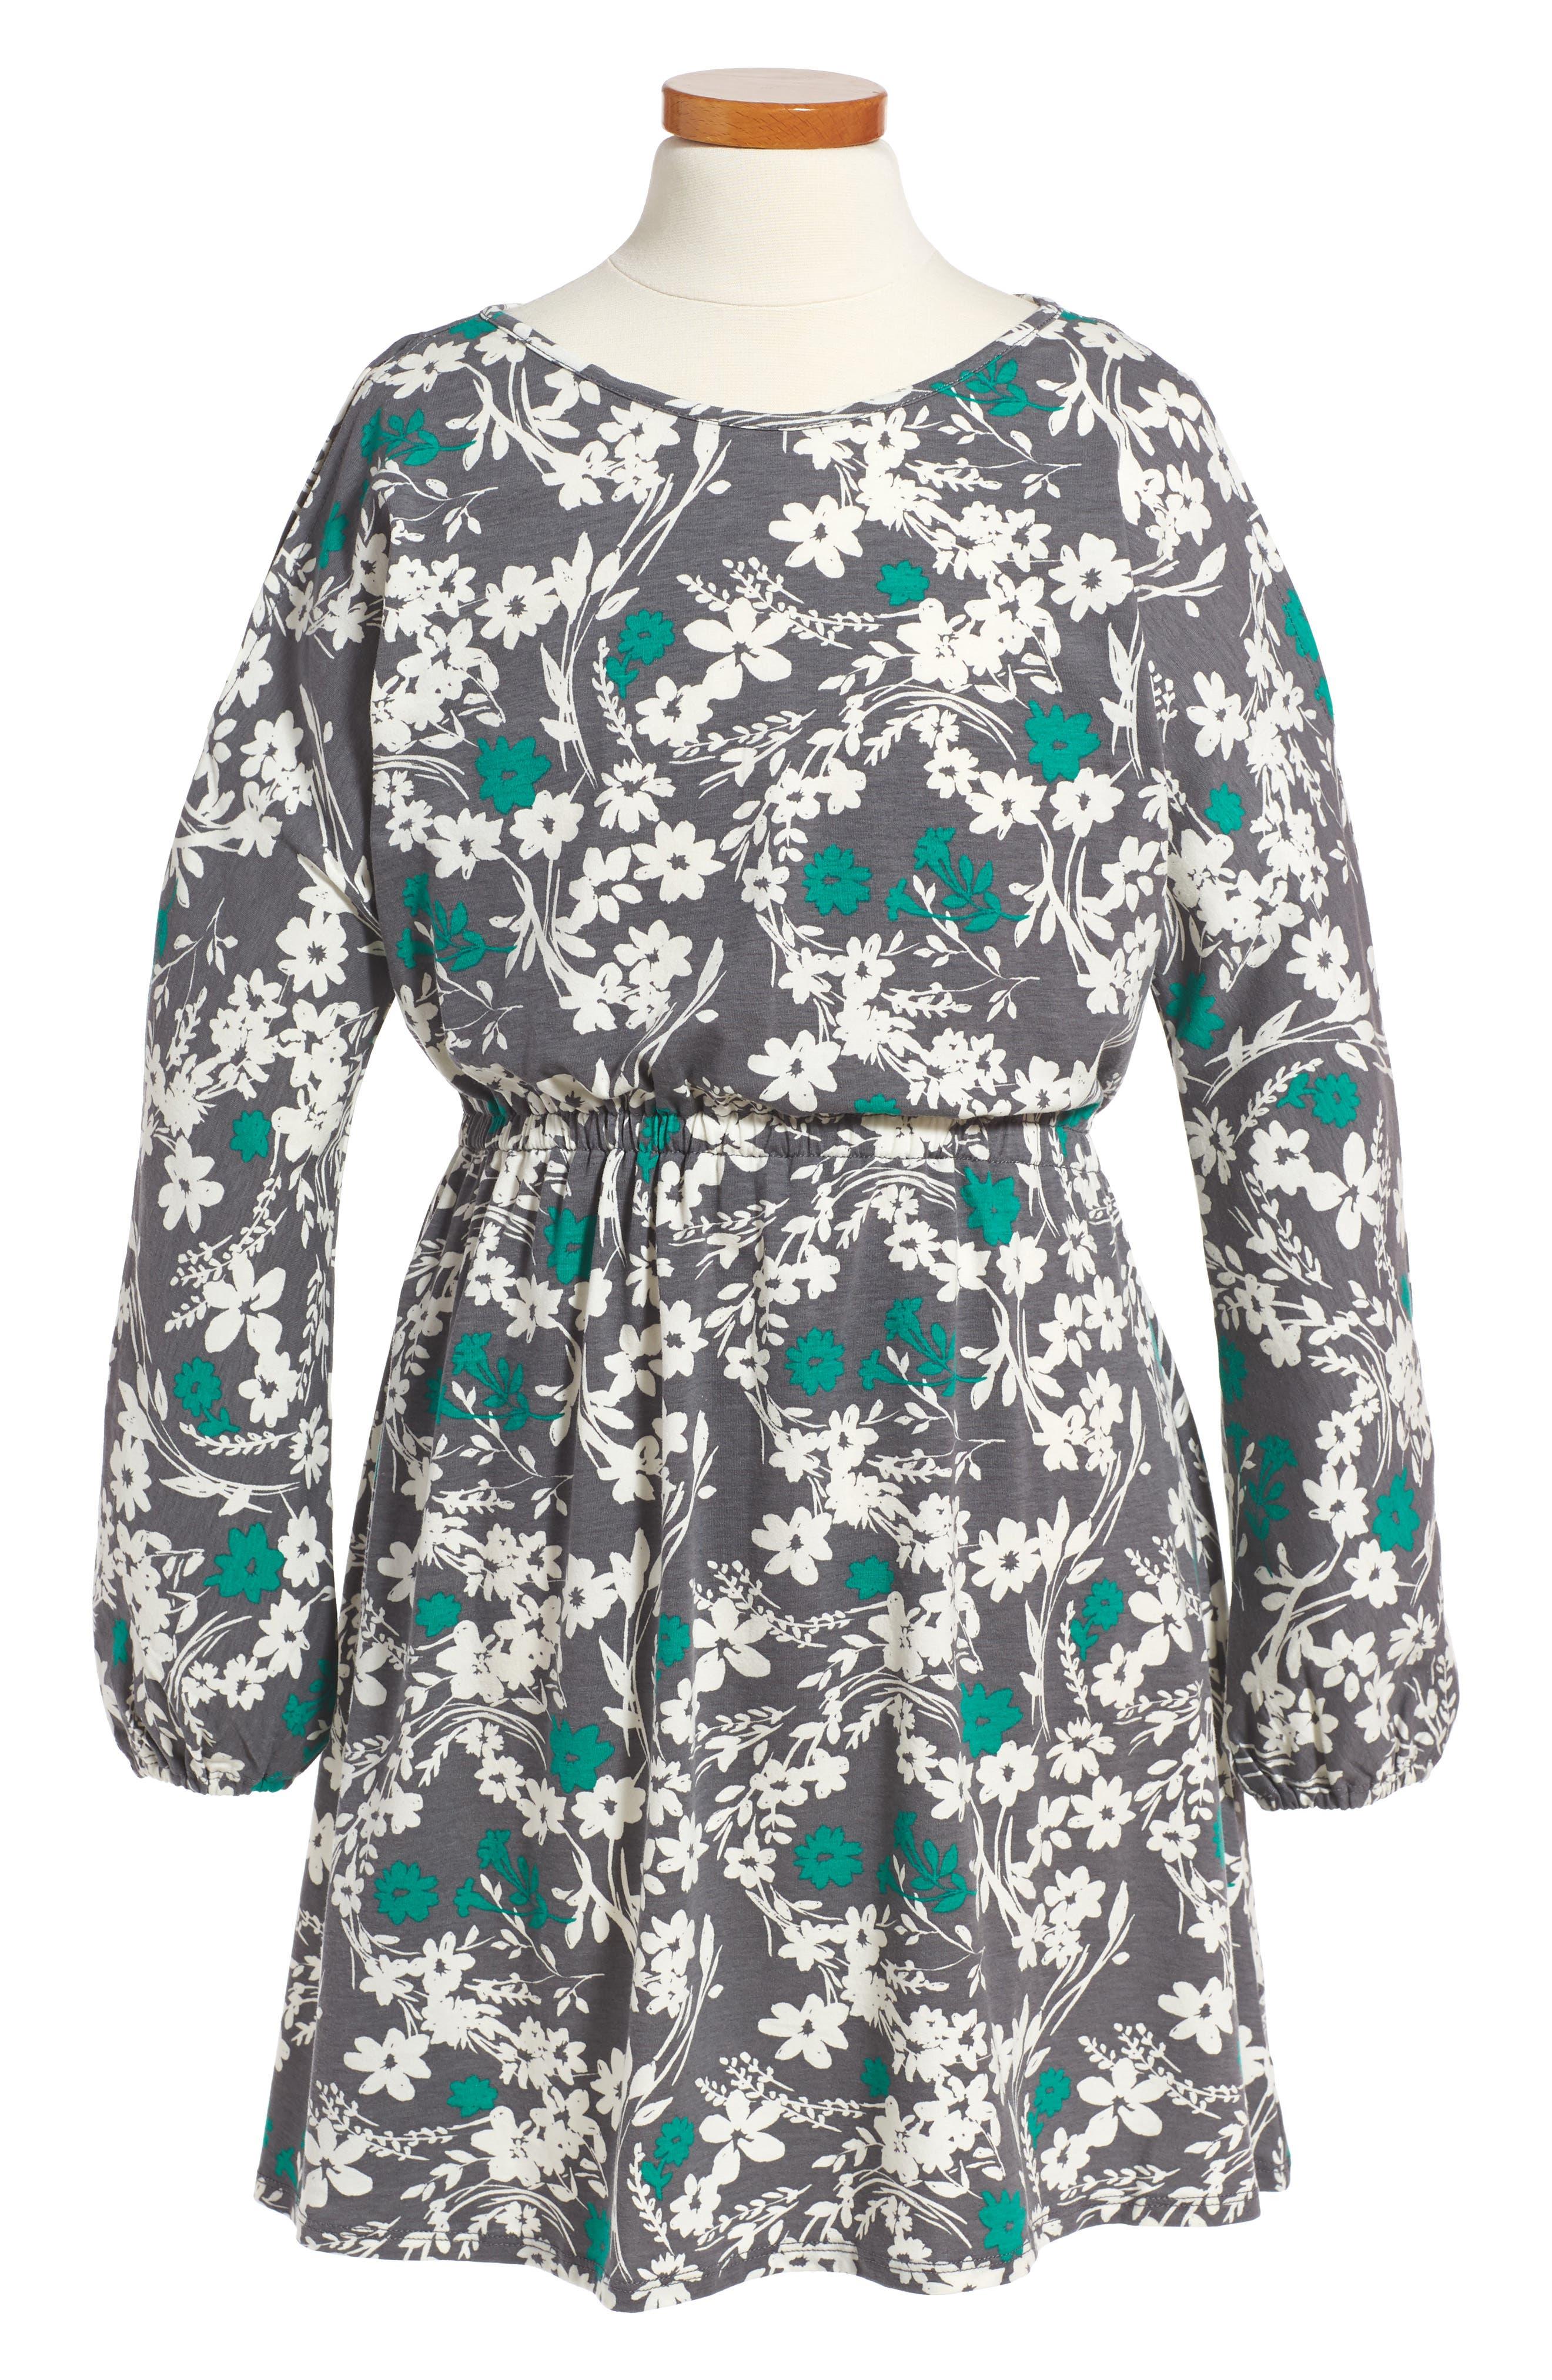 Cold Shoulder Print Dress,                             Main thumbnail 1, color,                             Grey Castlerock Shadow Floral